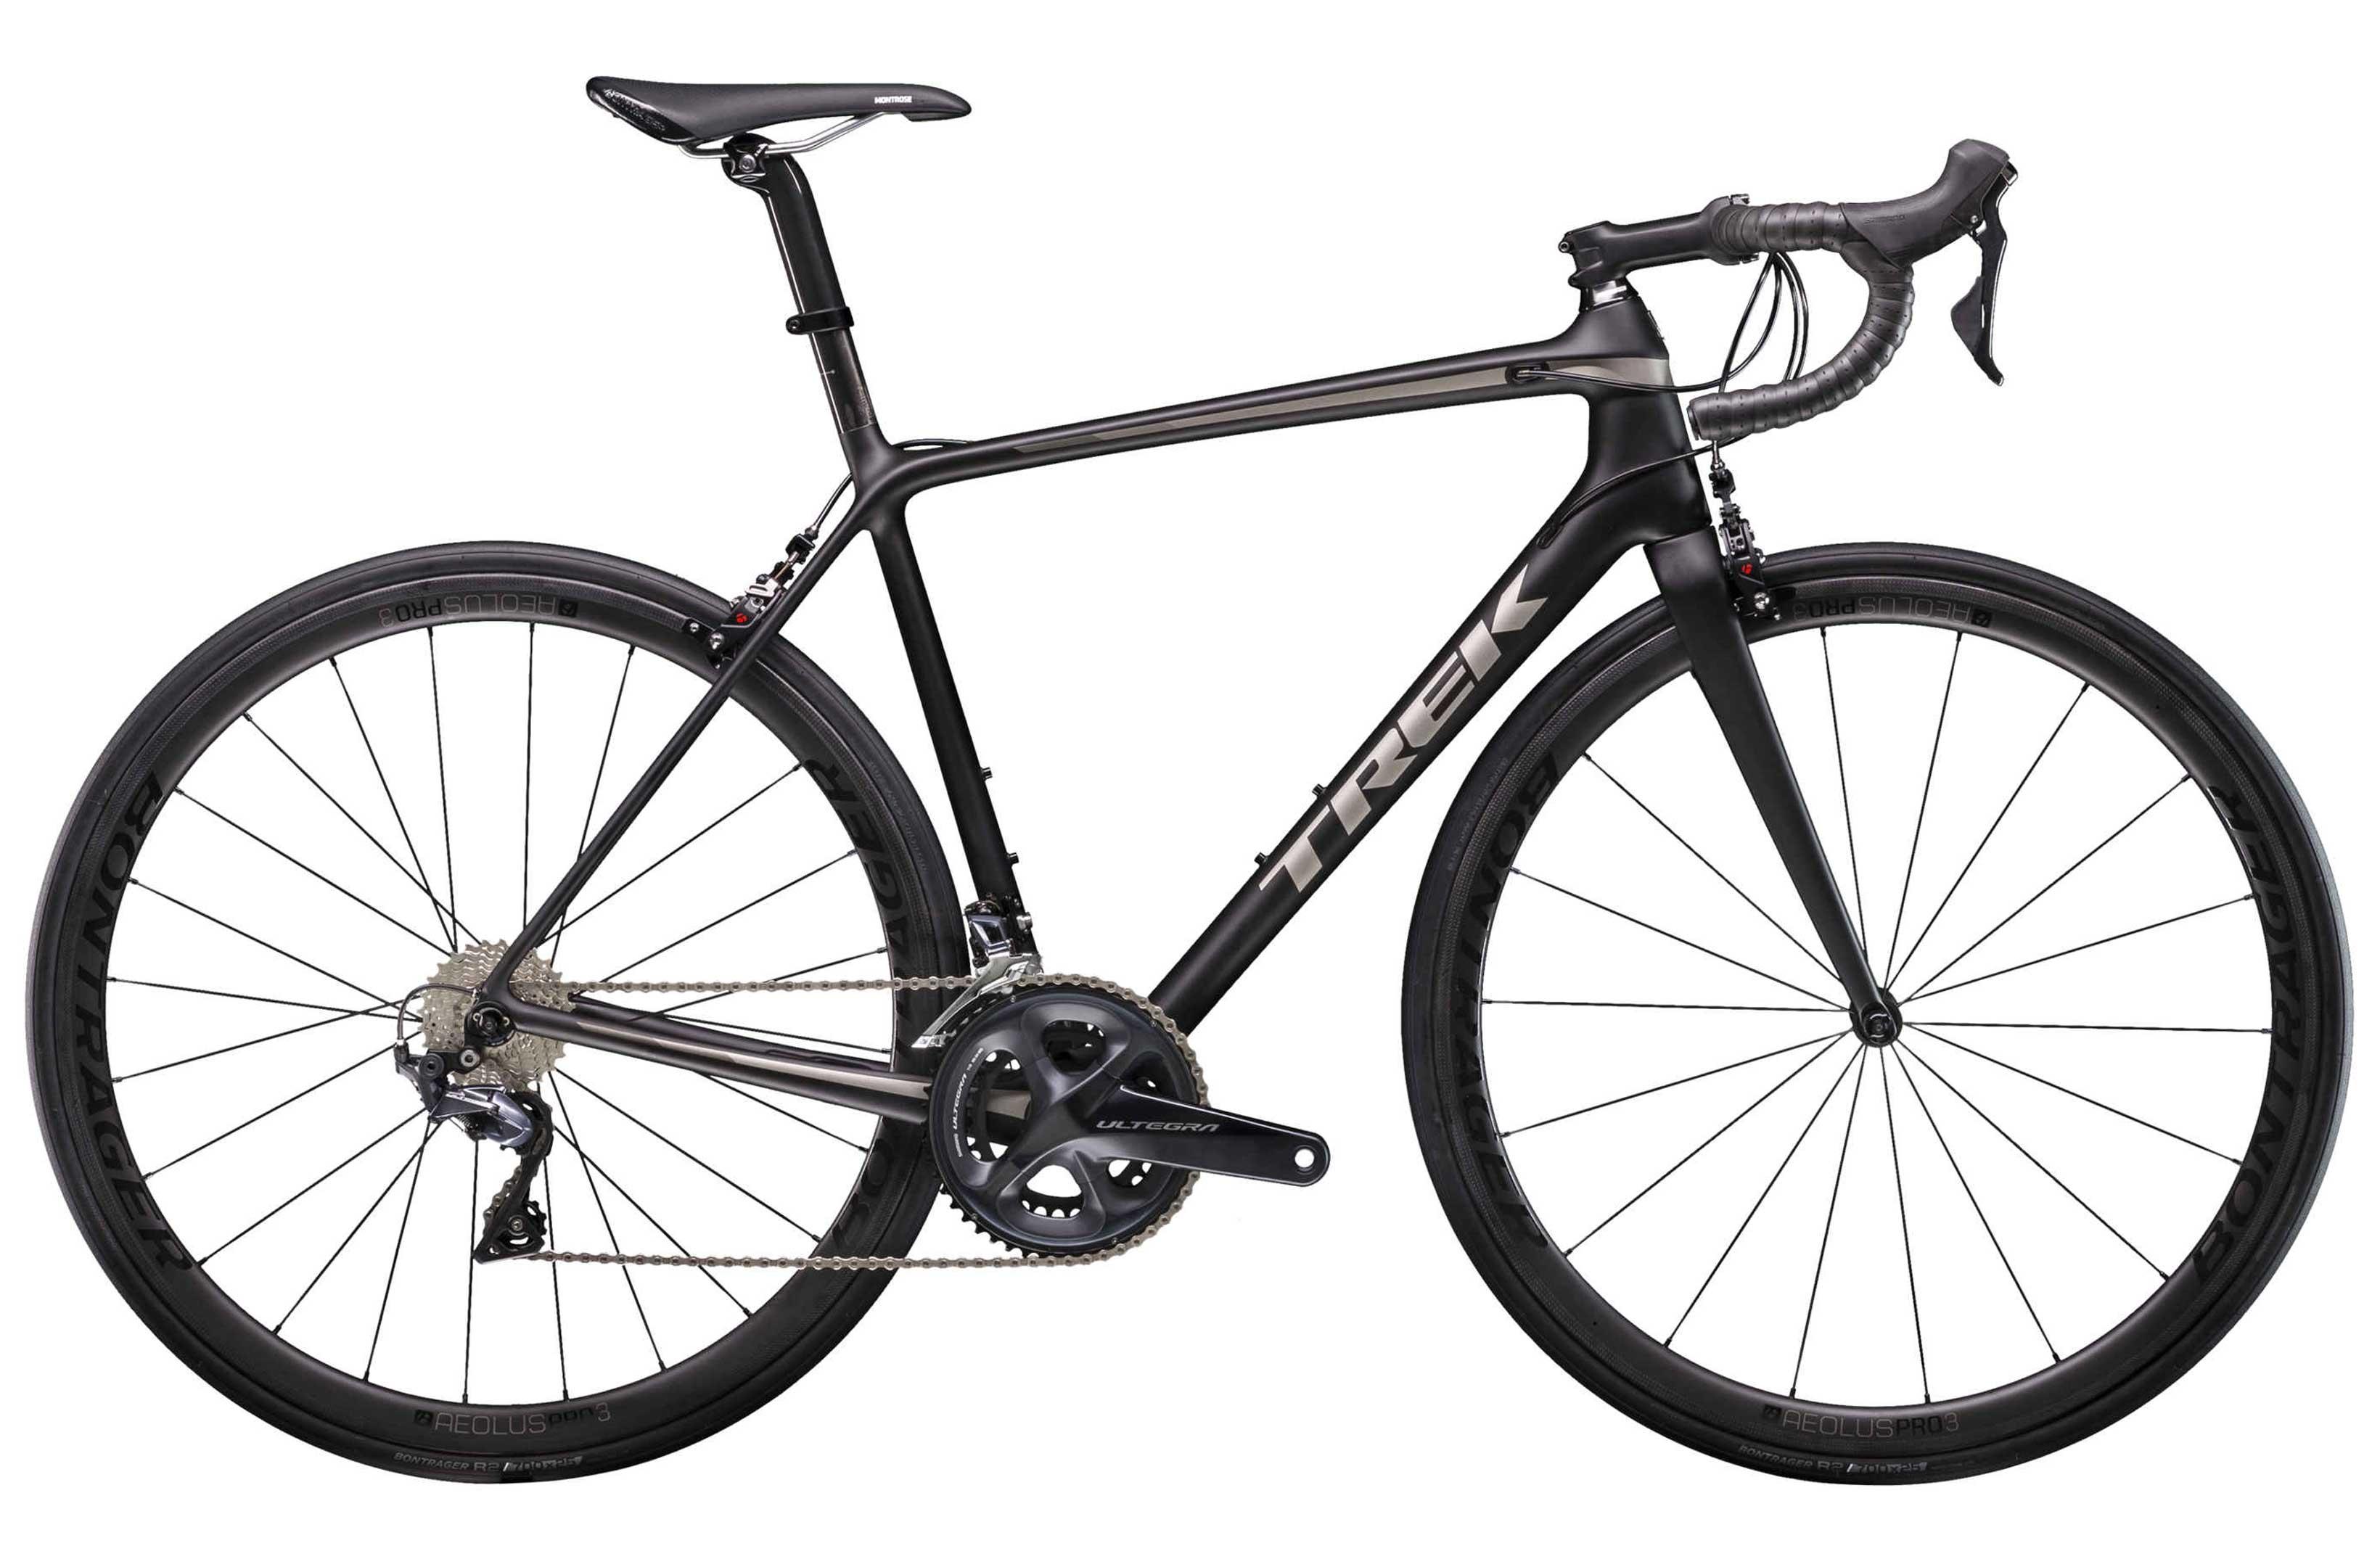 Trek Émonda SL 6 Pro 2019 Road Bike (Black, 56cm)